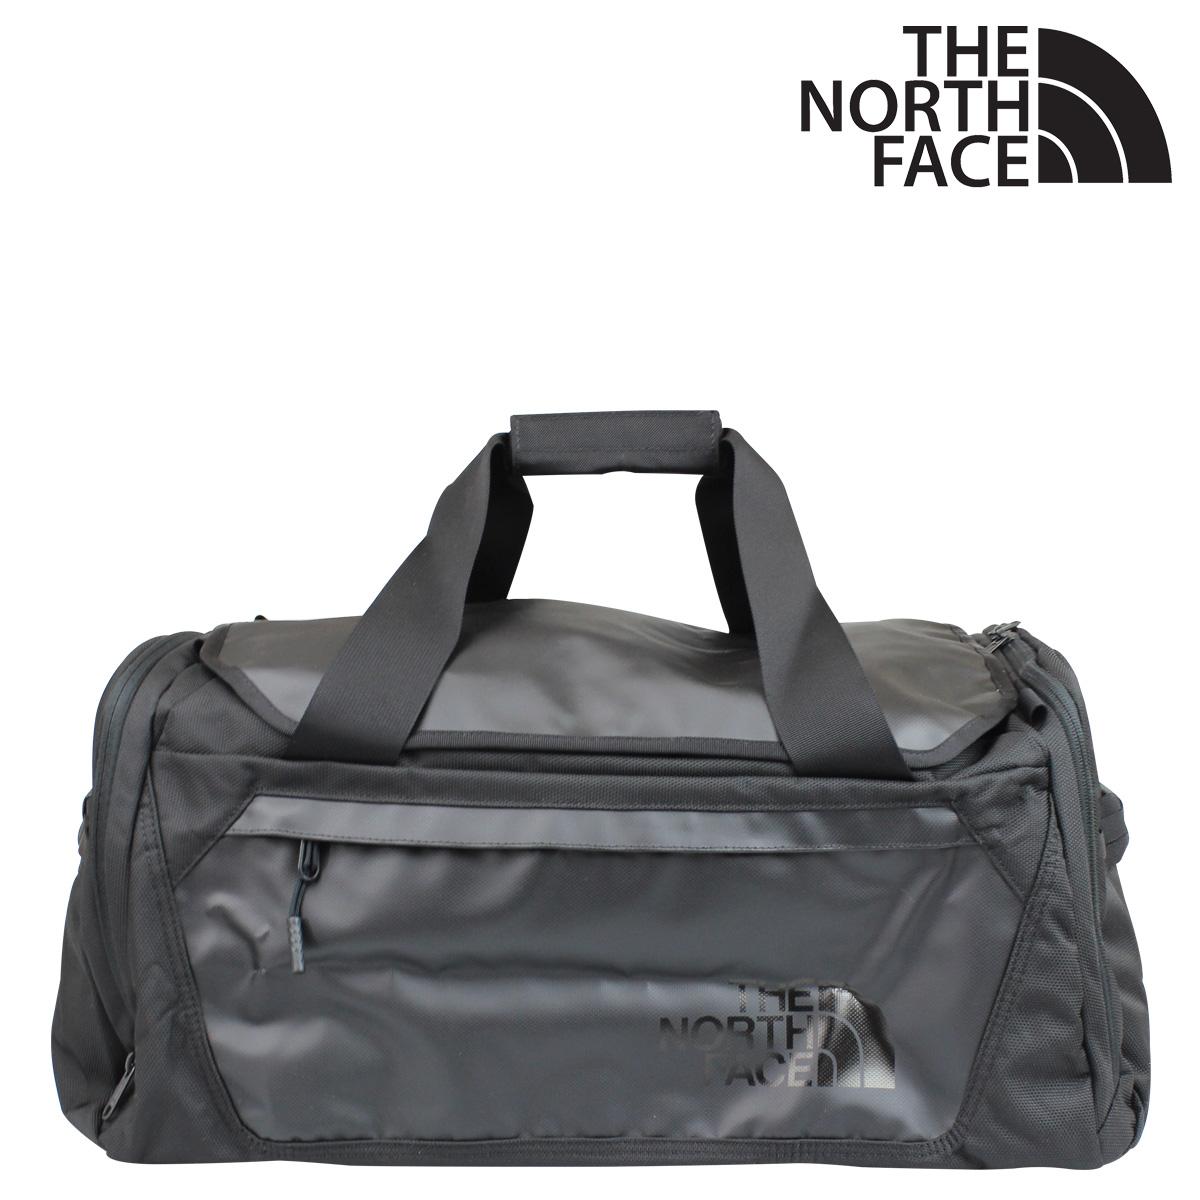 Whats Up Sports Sold Out North Face The Duffel Bag Boston Cf50 60l Landfall Expandable Men Gap Dis Rakuten Global Market